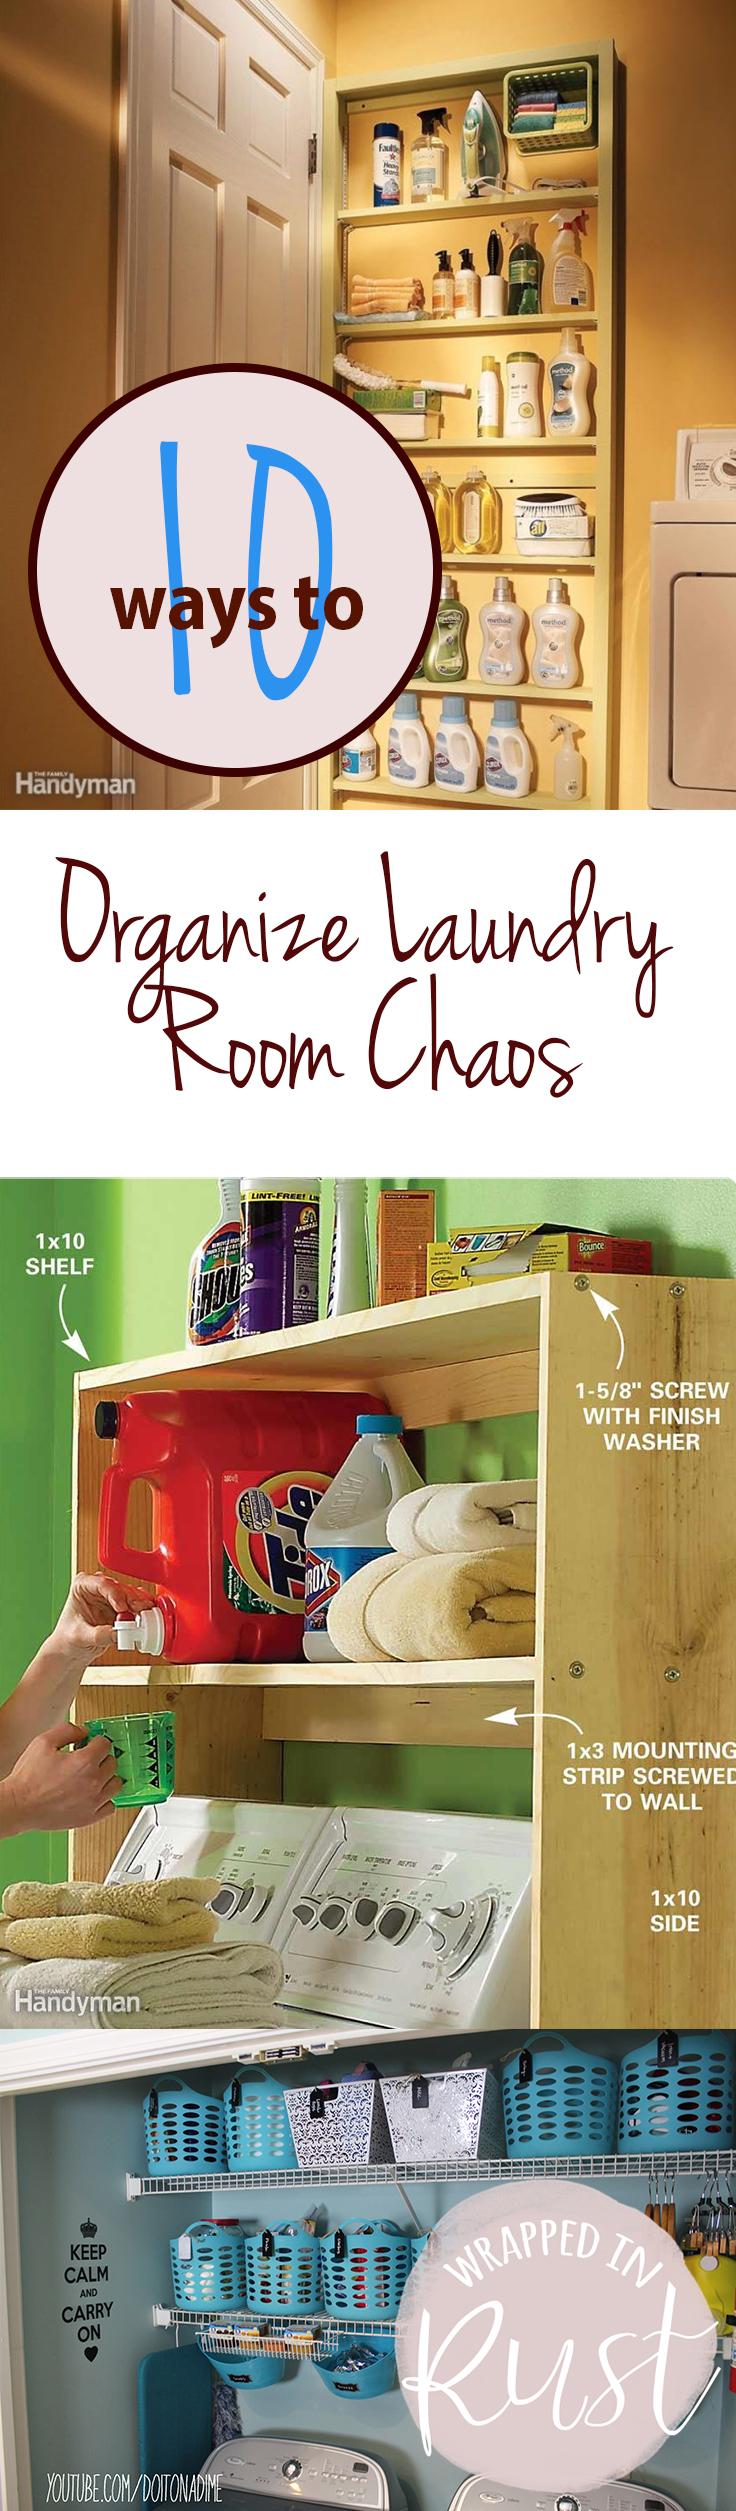 10 Ways To Organize Laundry Room Chaos  Organize Laundry Rooms, How To Organize  Laundry